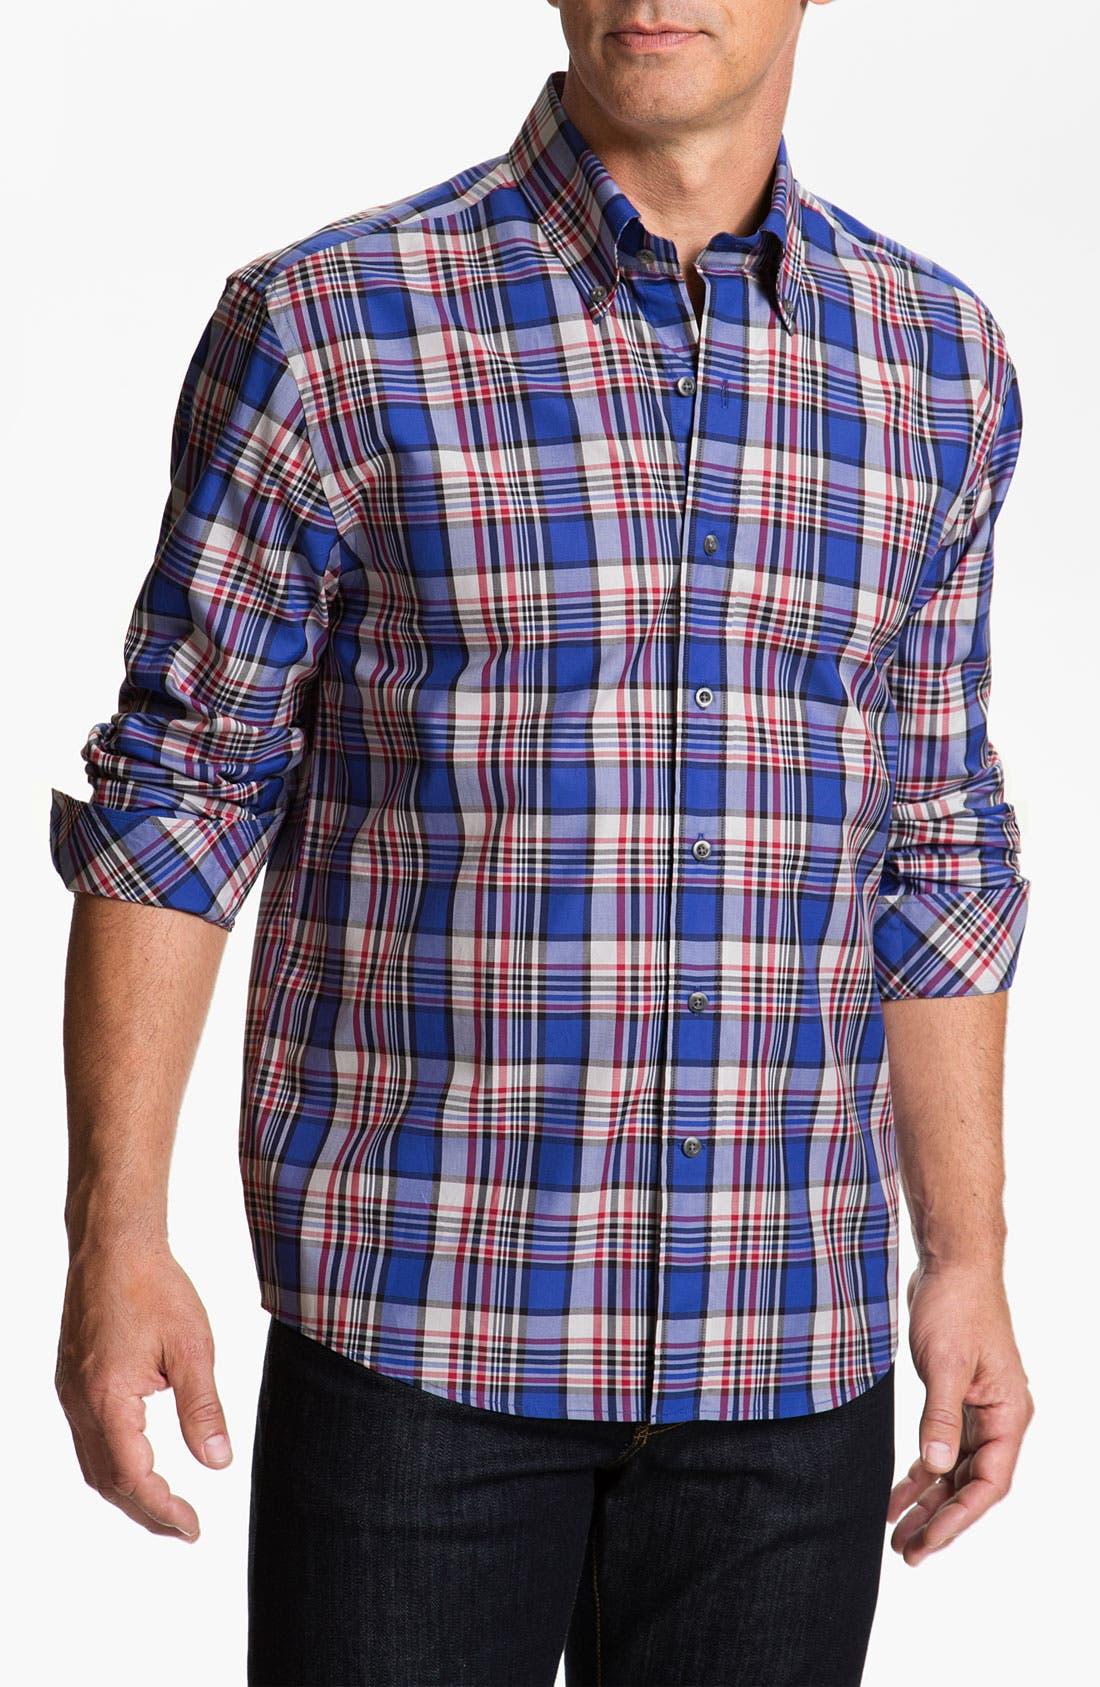 Alternate Image 1 Selected - Cutter & Buck 'Whistler' Plaid Woven Shirt